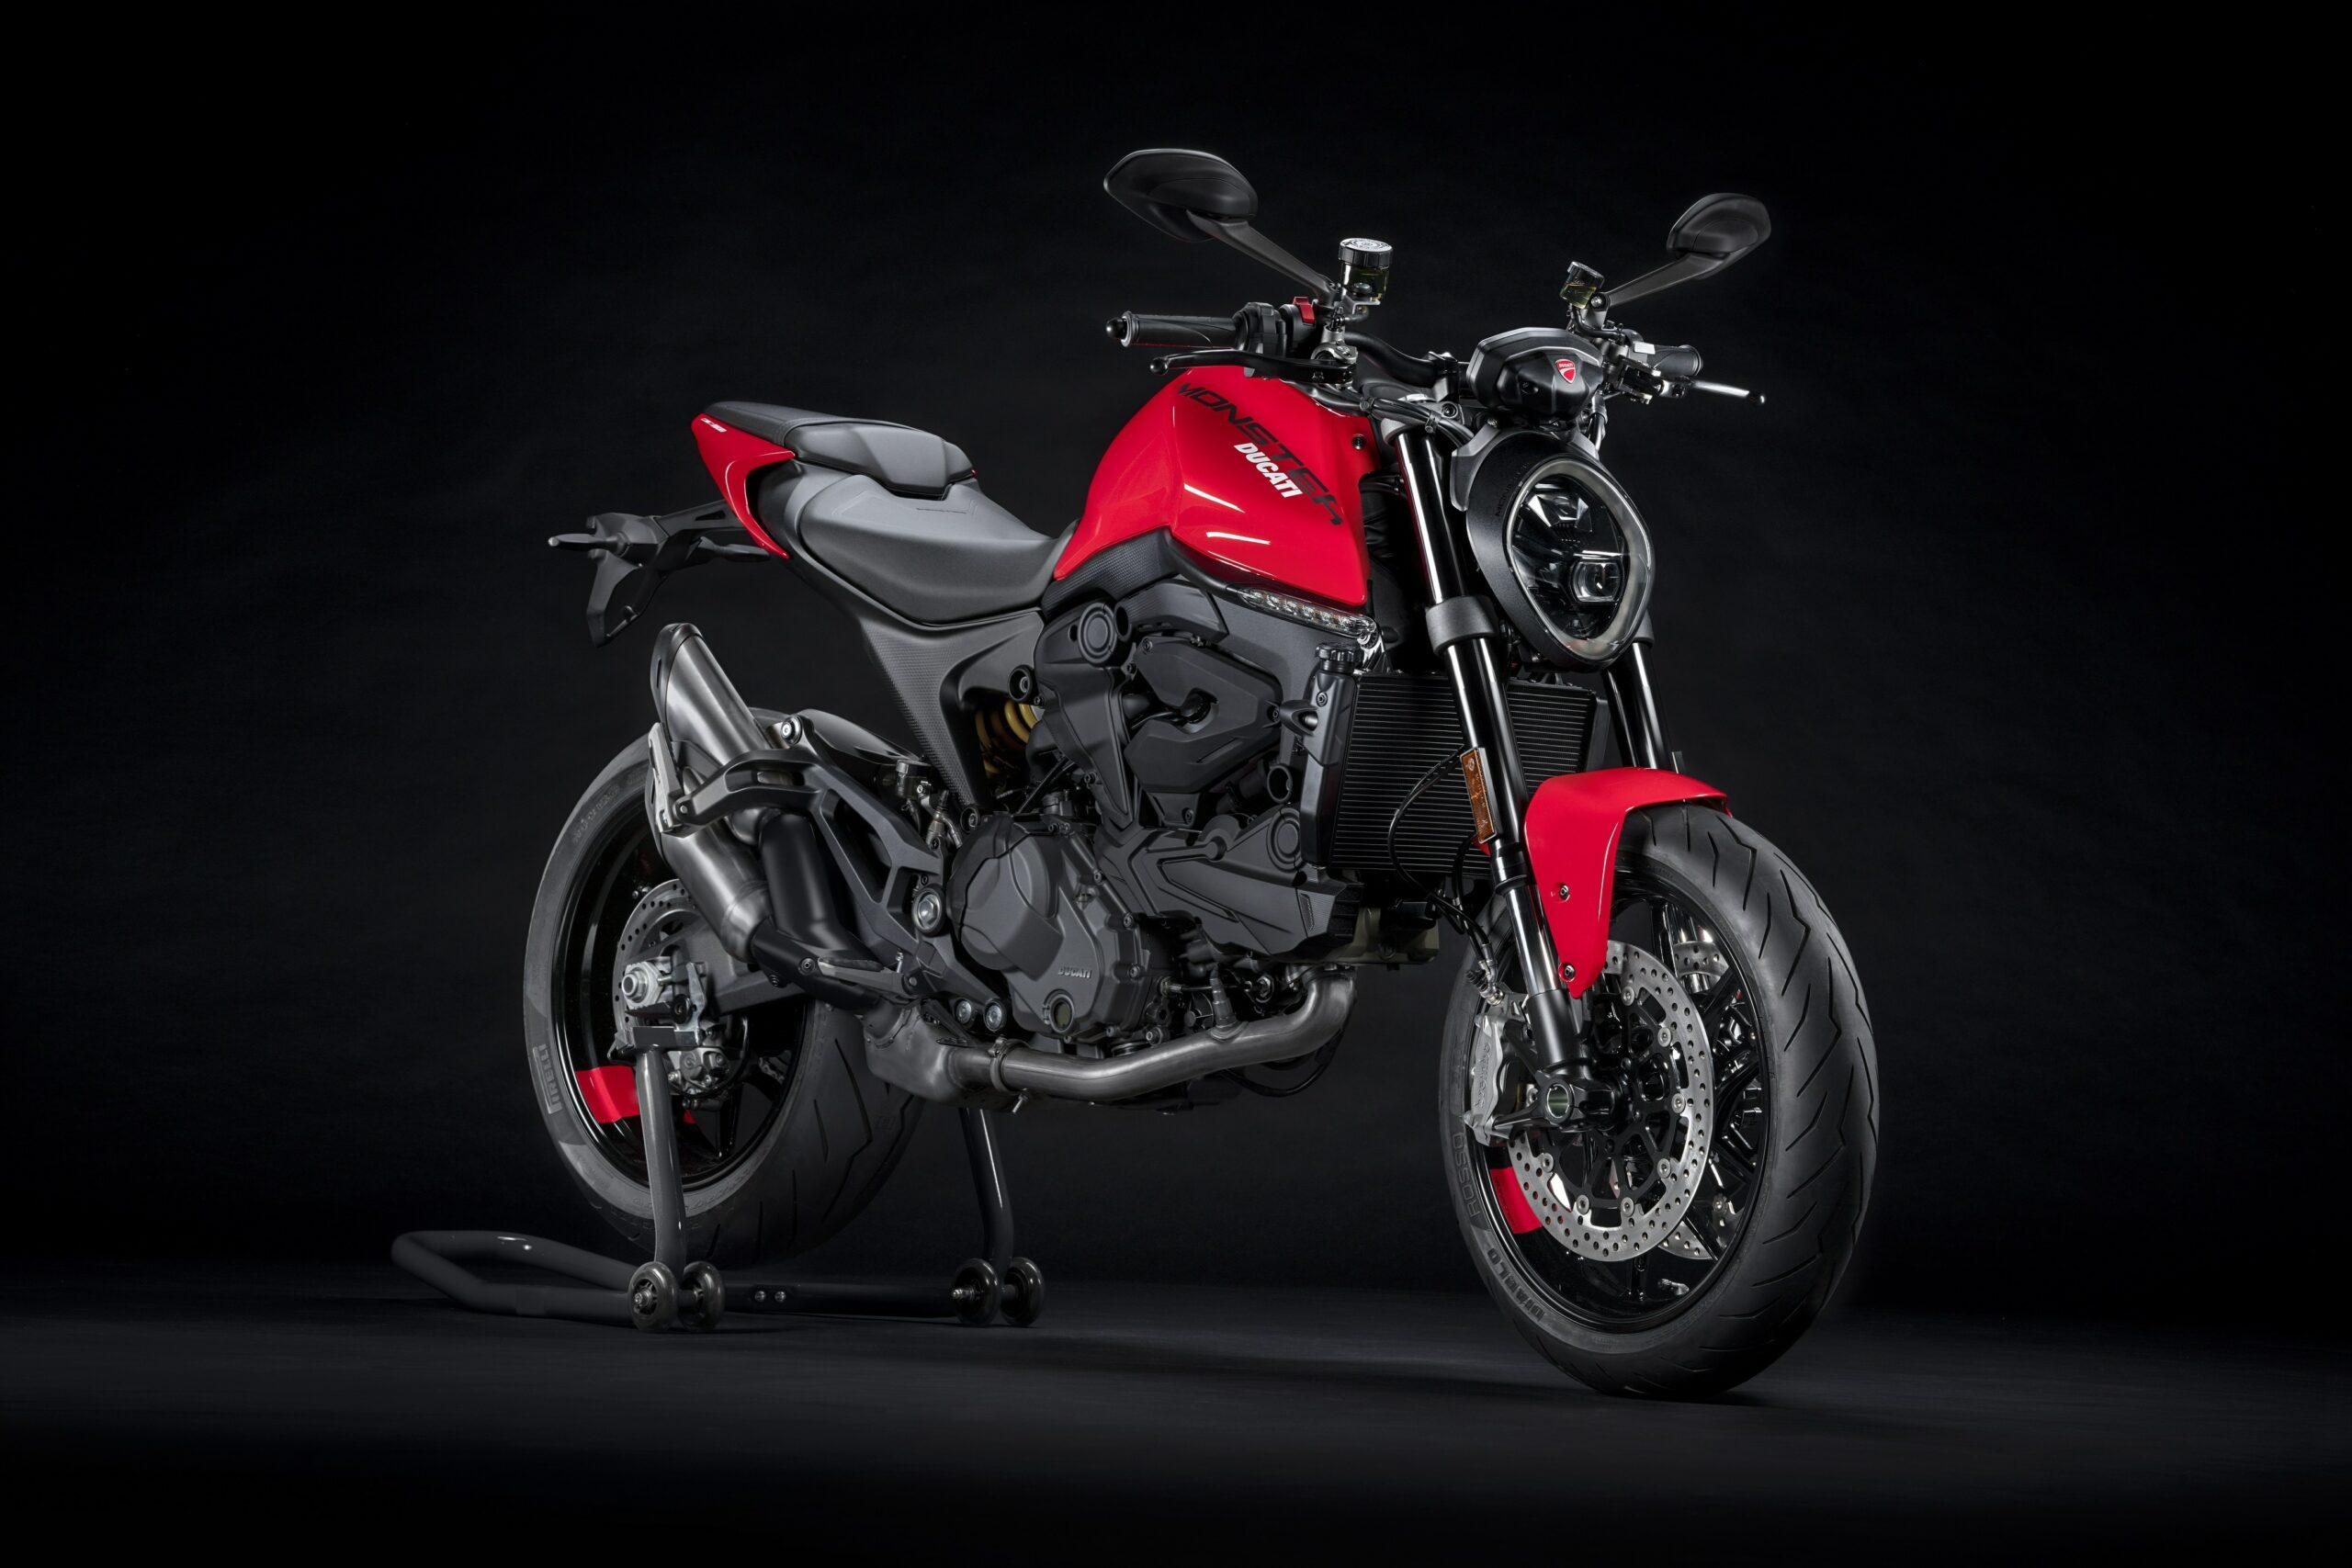 Ducati launches the 2021 Ducati Monster